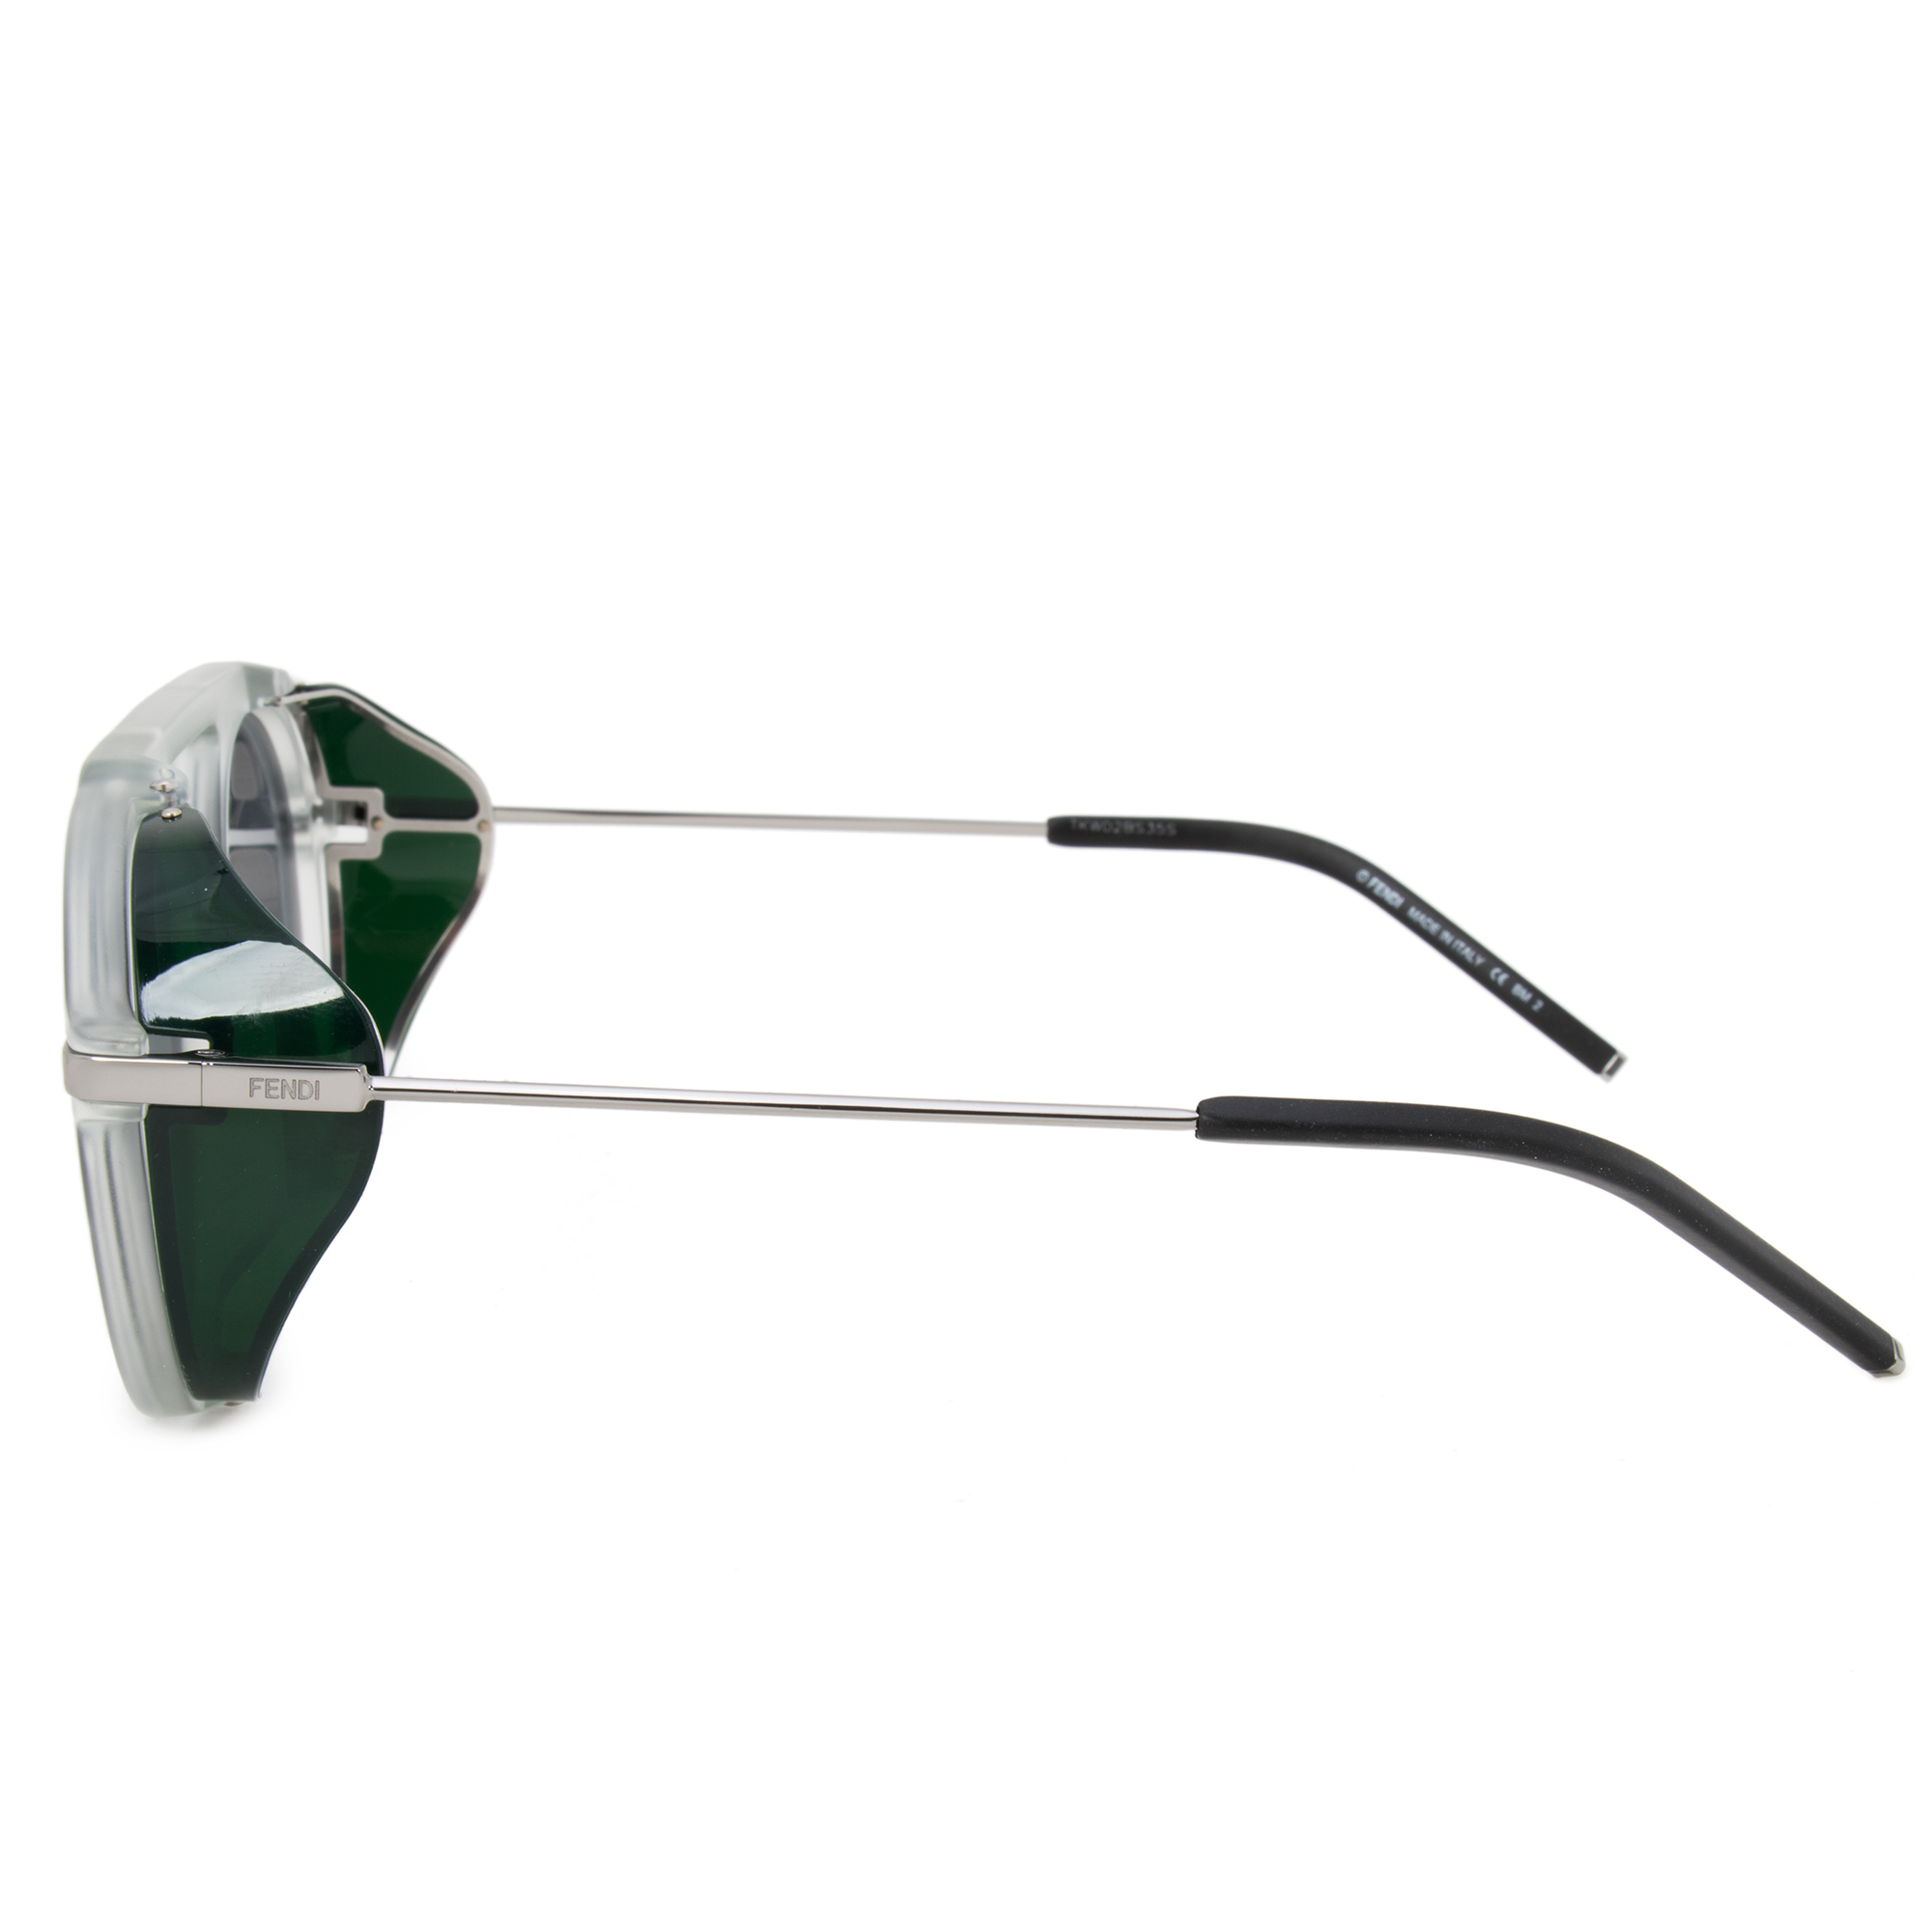 4669e337f387 Fendi - Fendi Fendi Fantastic FF M0012 900 IR Unisex Round Sunglasses -  Walmart.com